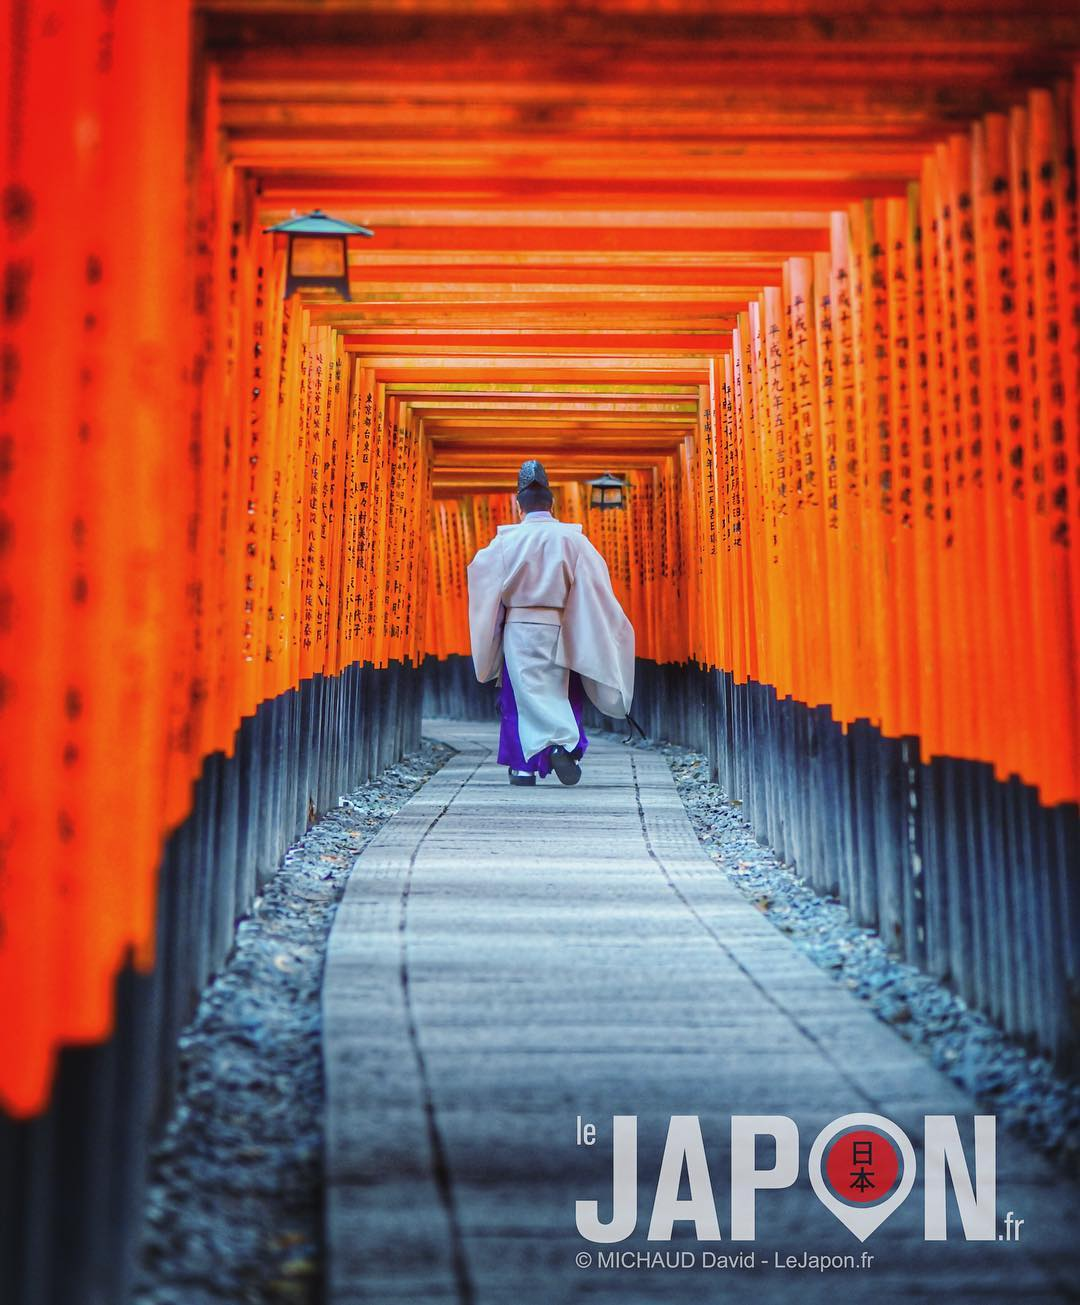 Un matin au sanctuaire Fushimi Inari ⛩⛩⛩🙏🏻✨ #Japon #KyotoSafari #Inari #Kyoto